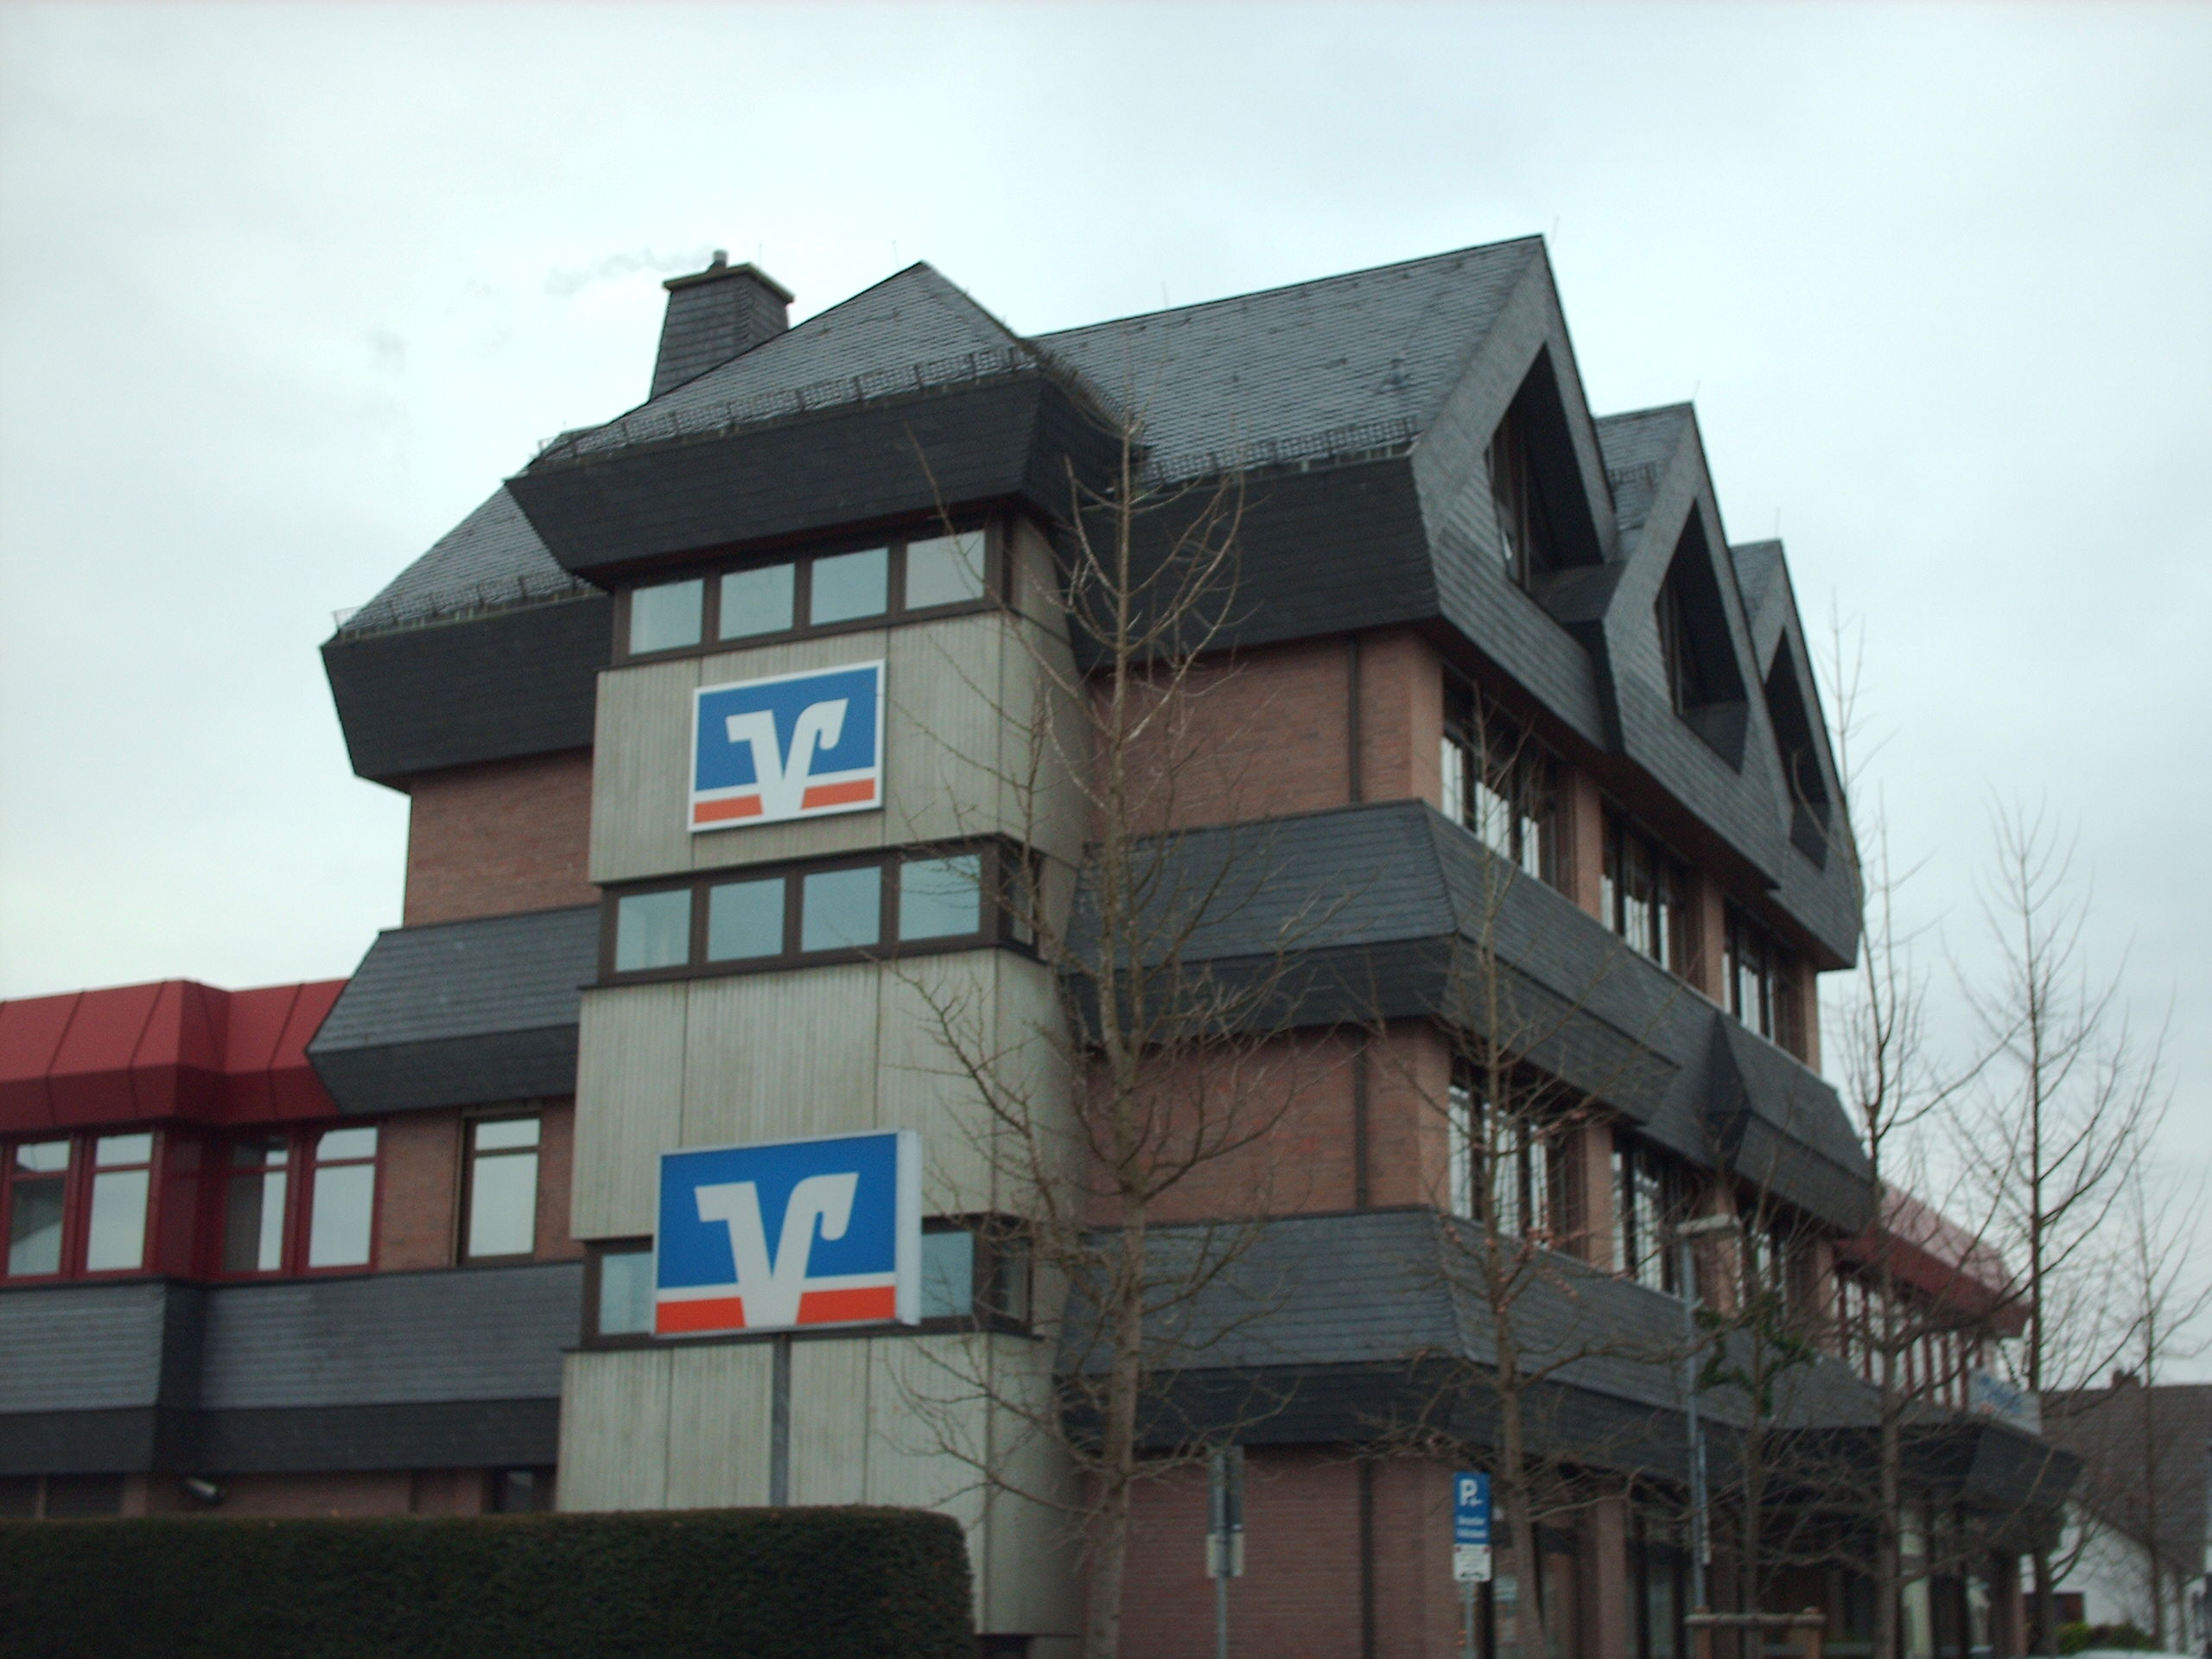 Filevolksbank Heuchelheimjpg Wikimedia Commons